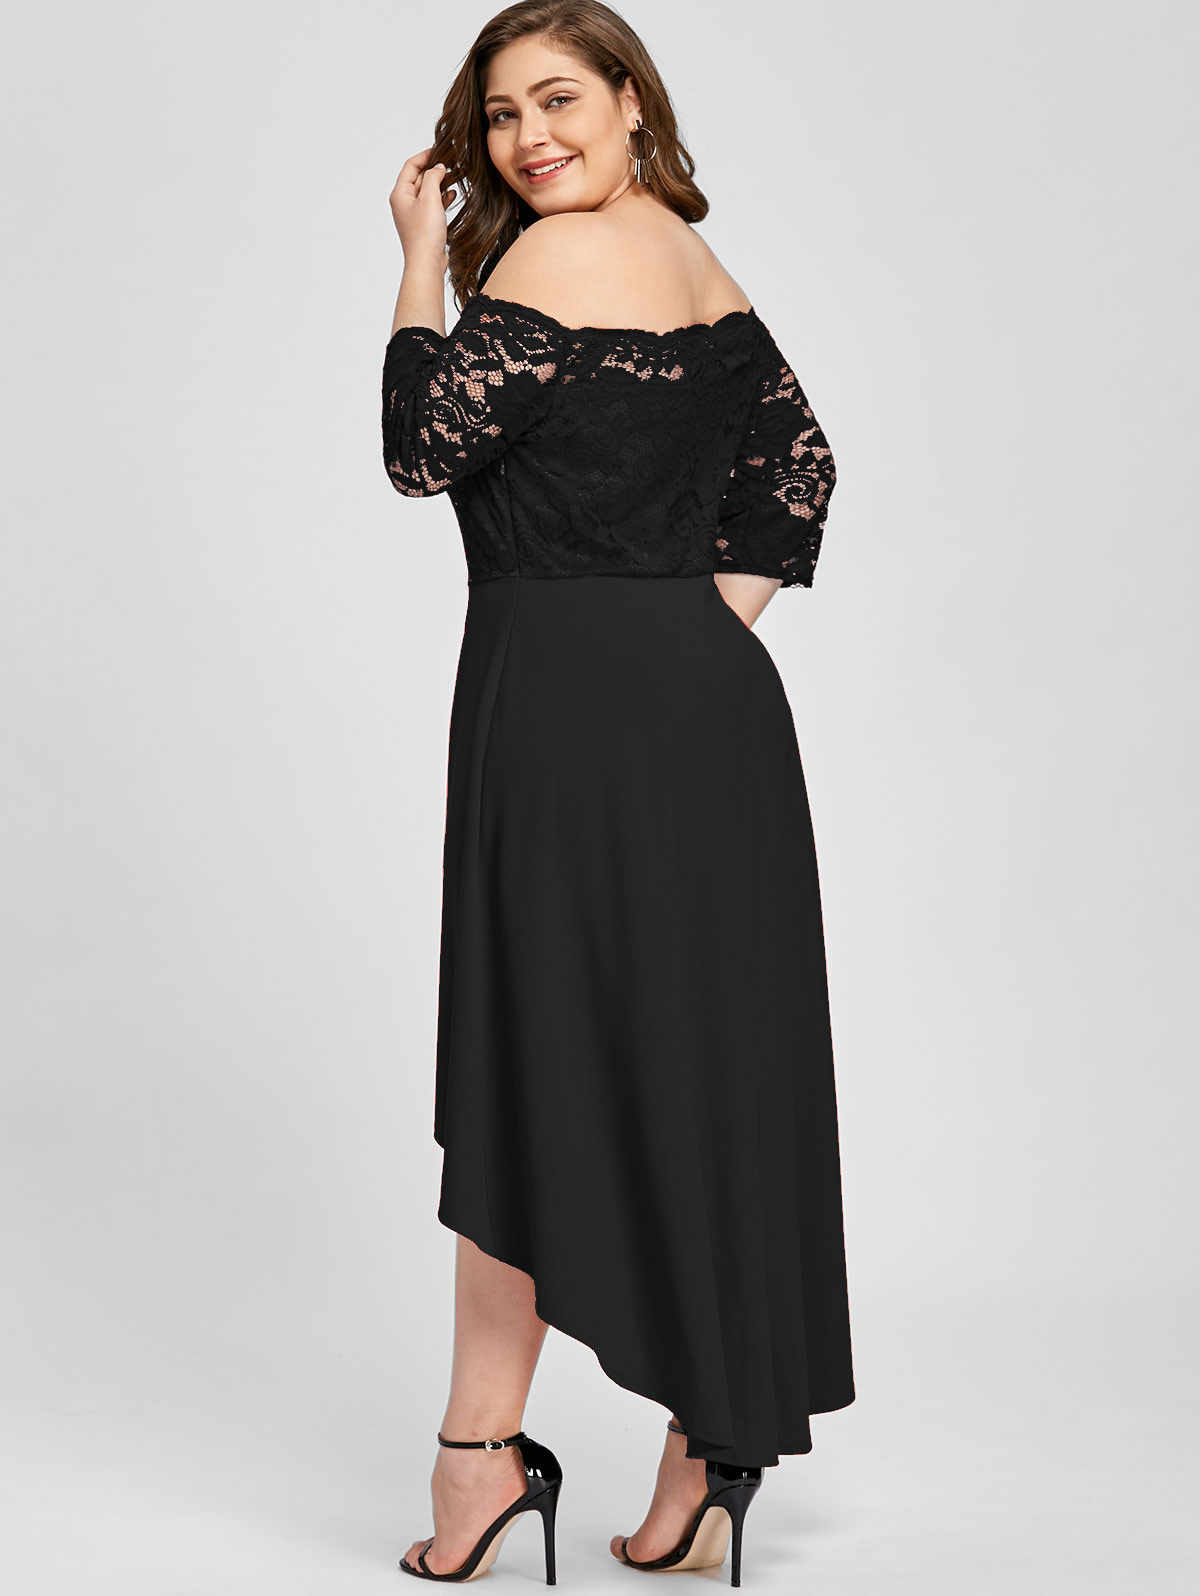 ... Wipalo Women Party Dress Plus Size Off Shoulder Dip Hem Lace 3 4 Length  Sleeves ... b1ab8bafadde